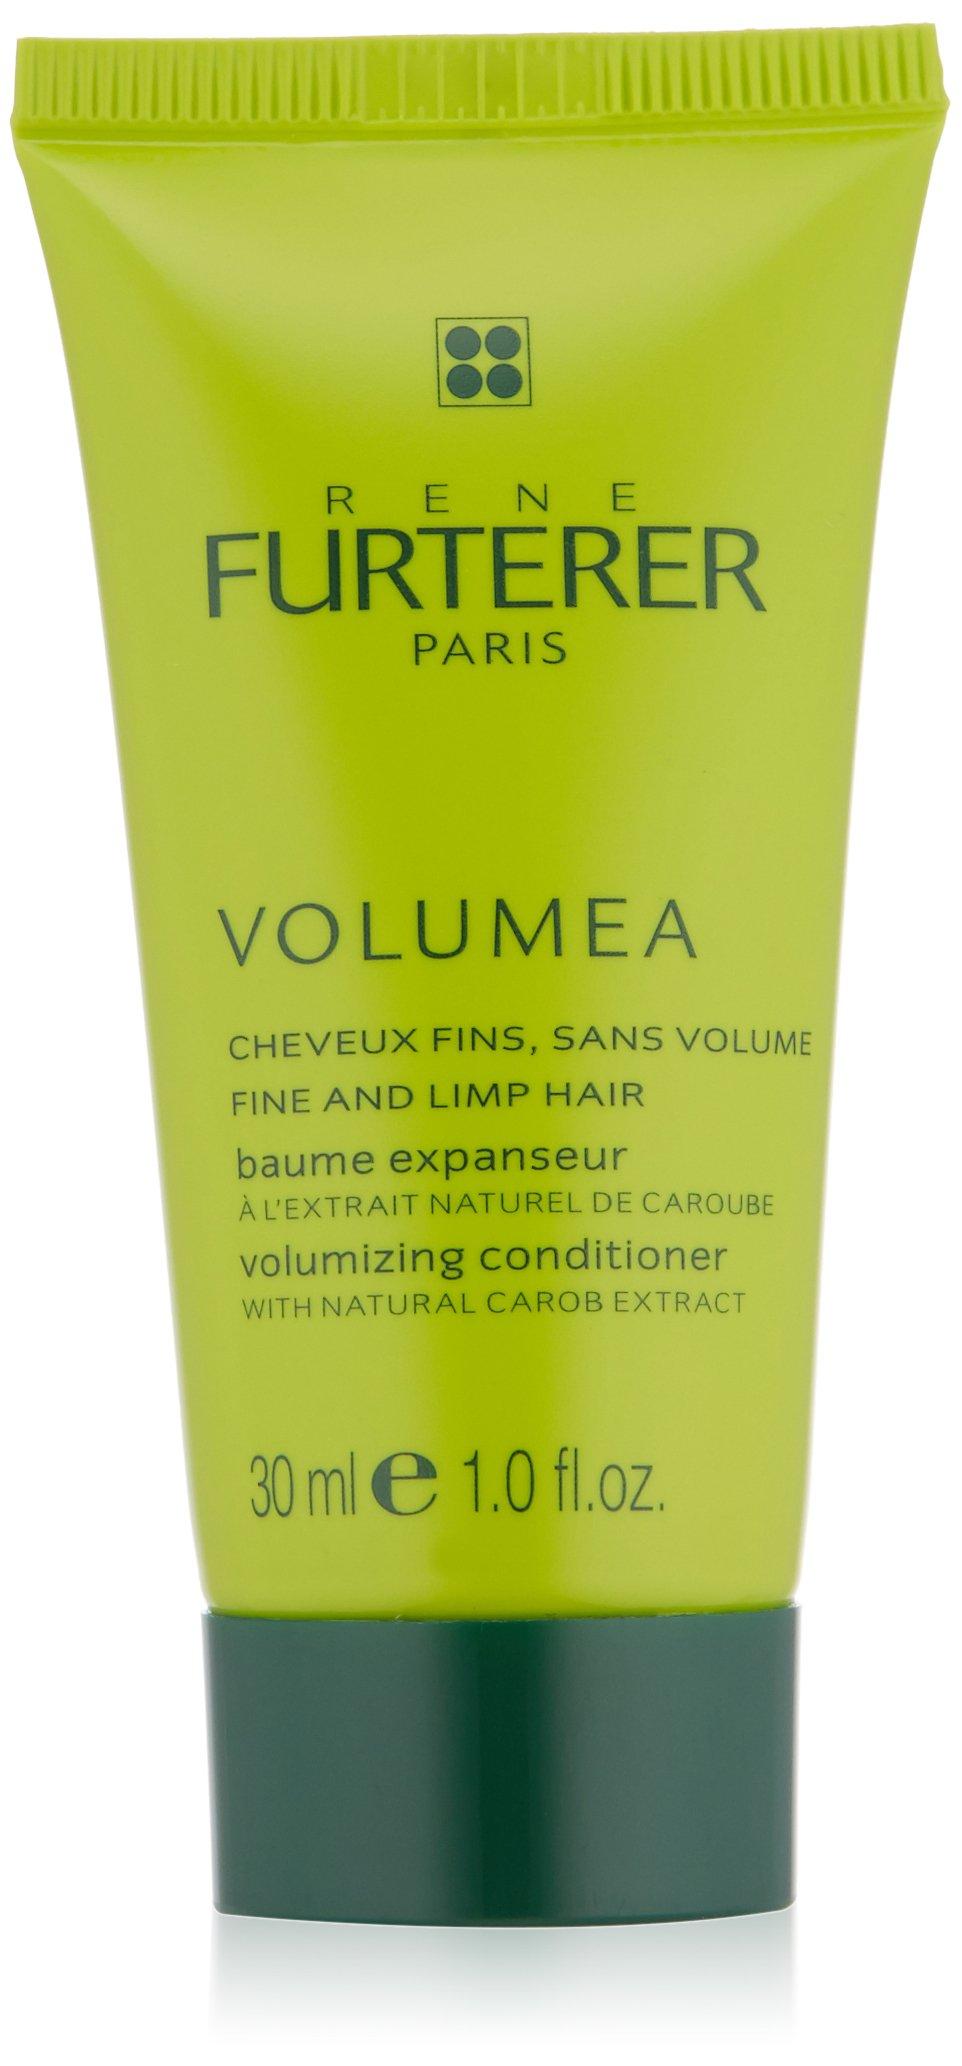 Rene Furterer Volumea Volumizing Conditioner, 1.0 fl. oz.